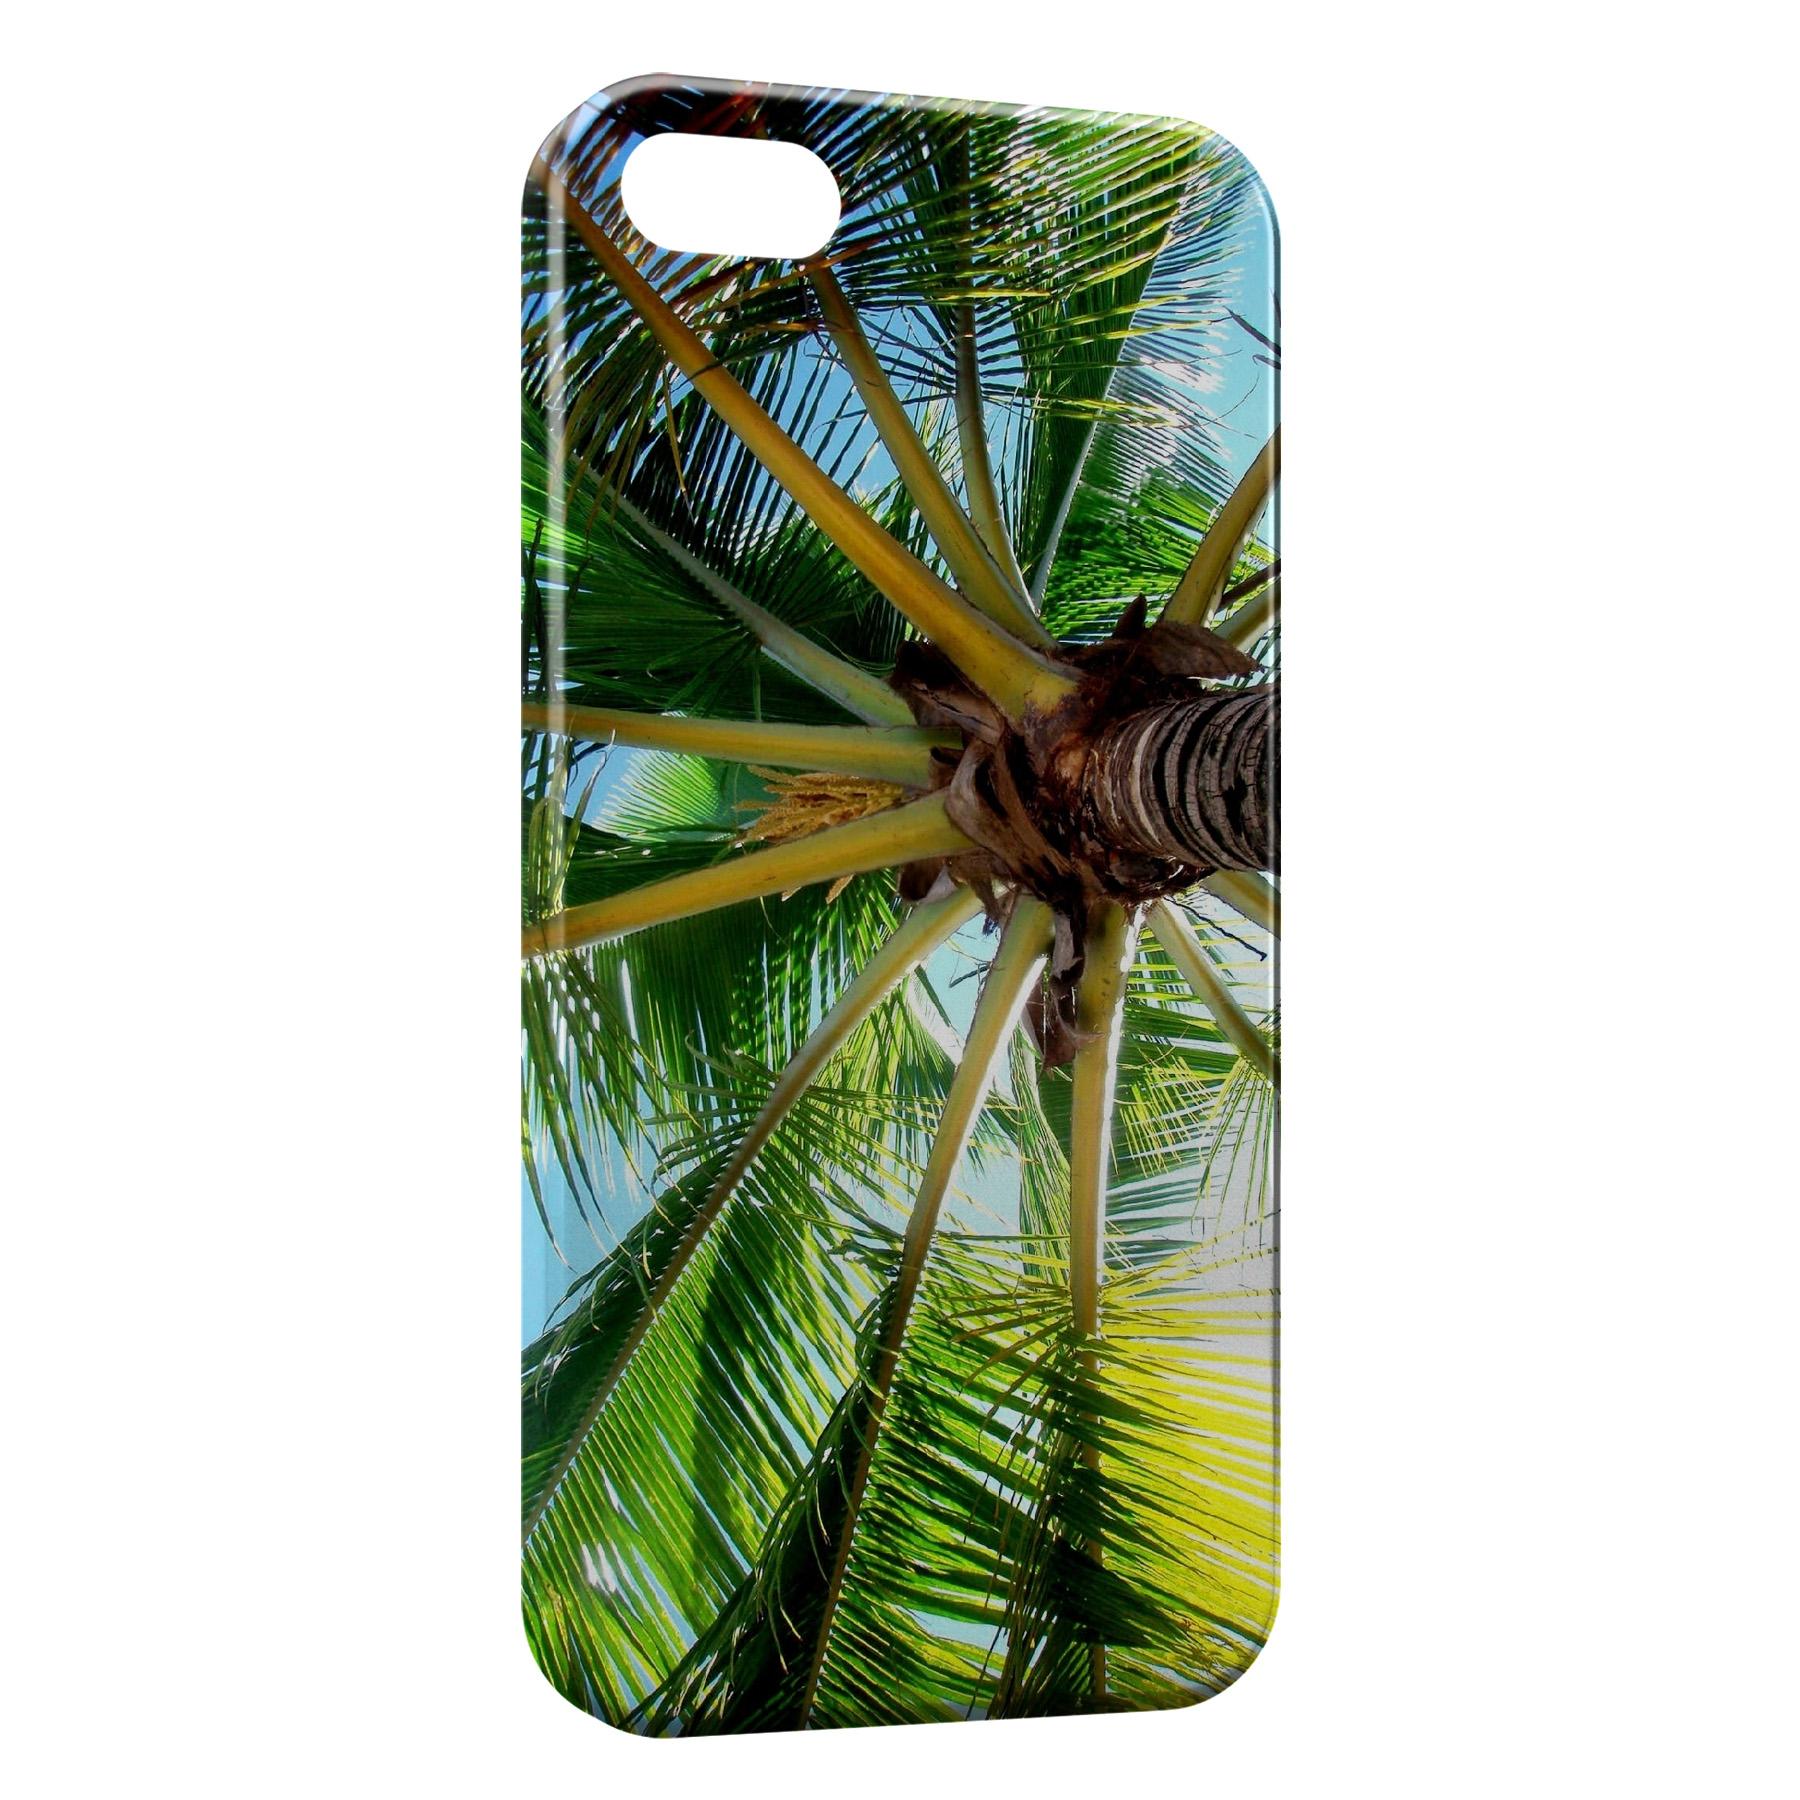 coque iphone 6 s palmier